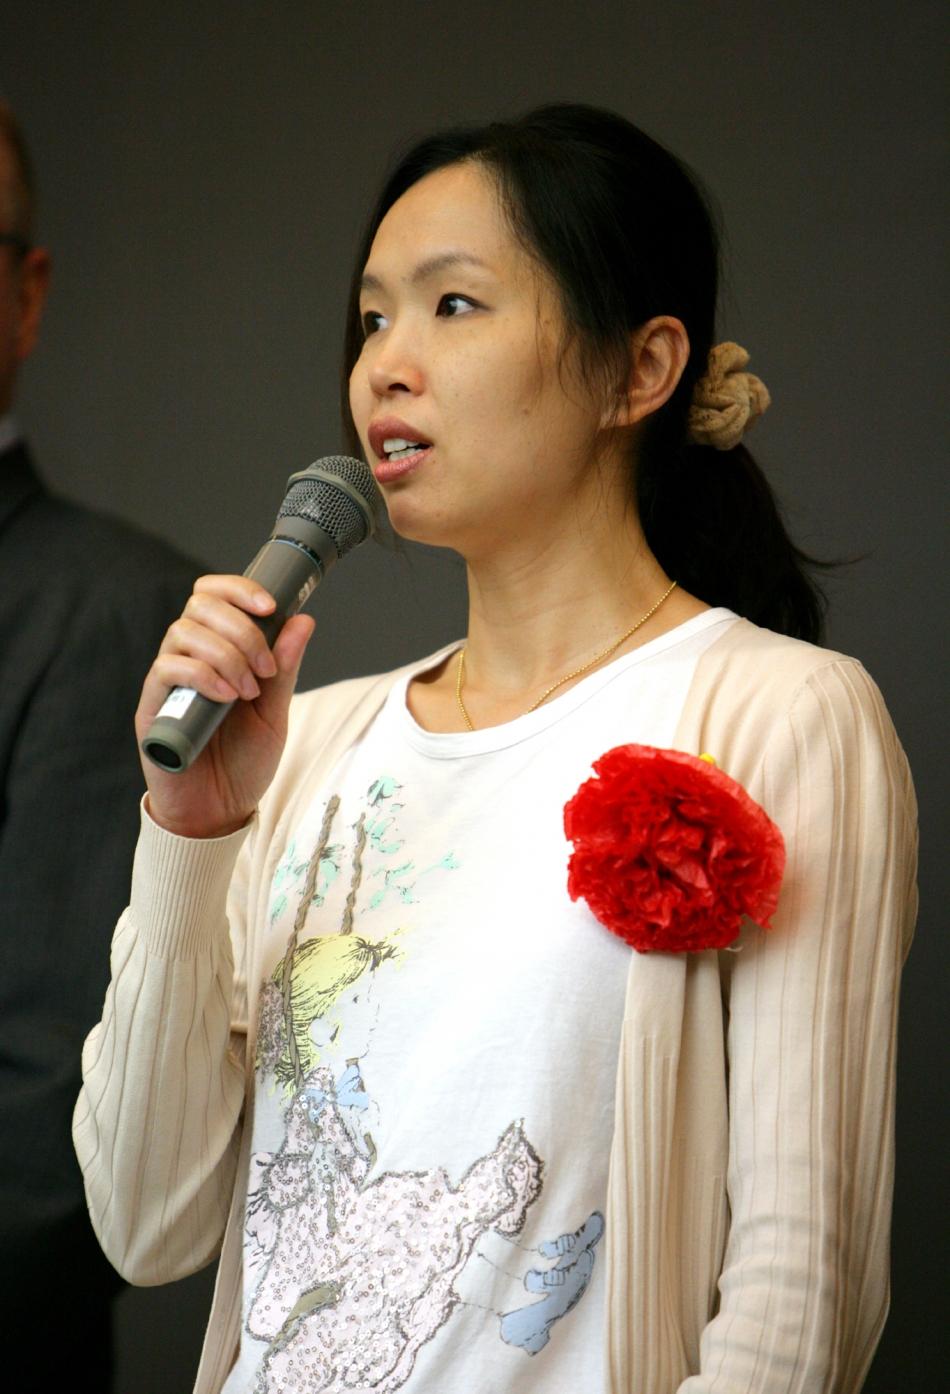 Euisook Chae, 2011